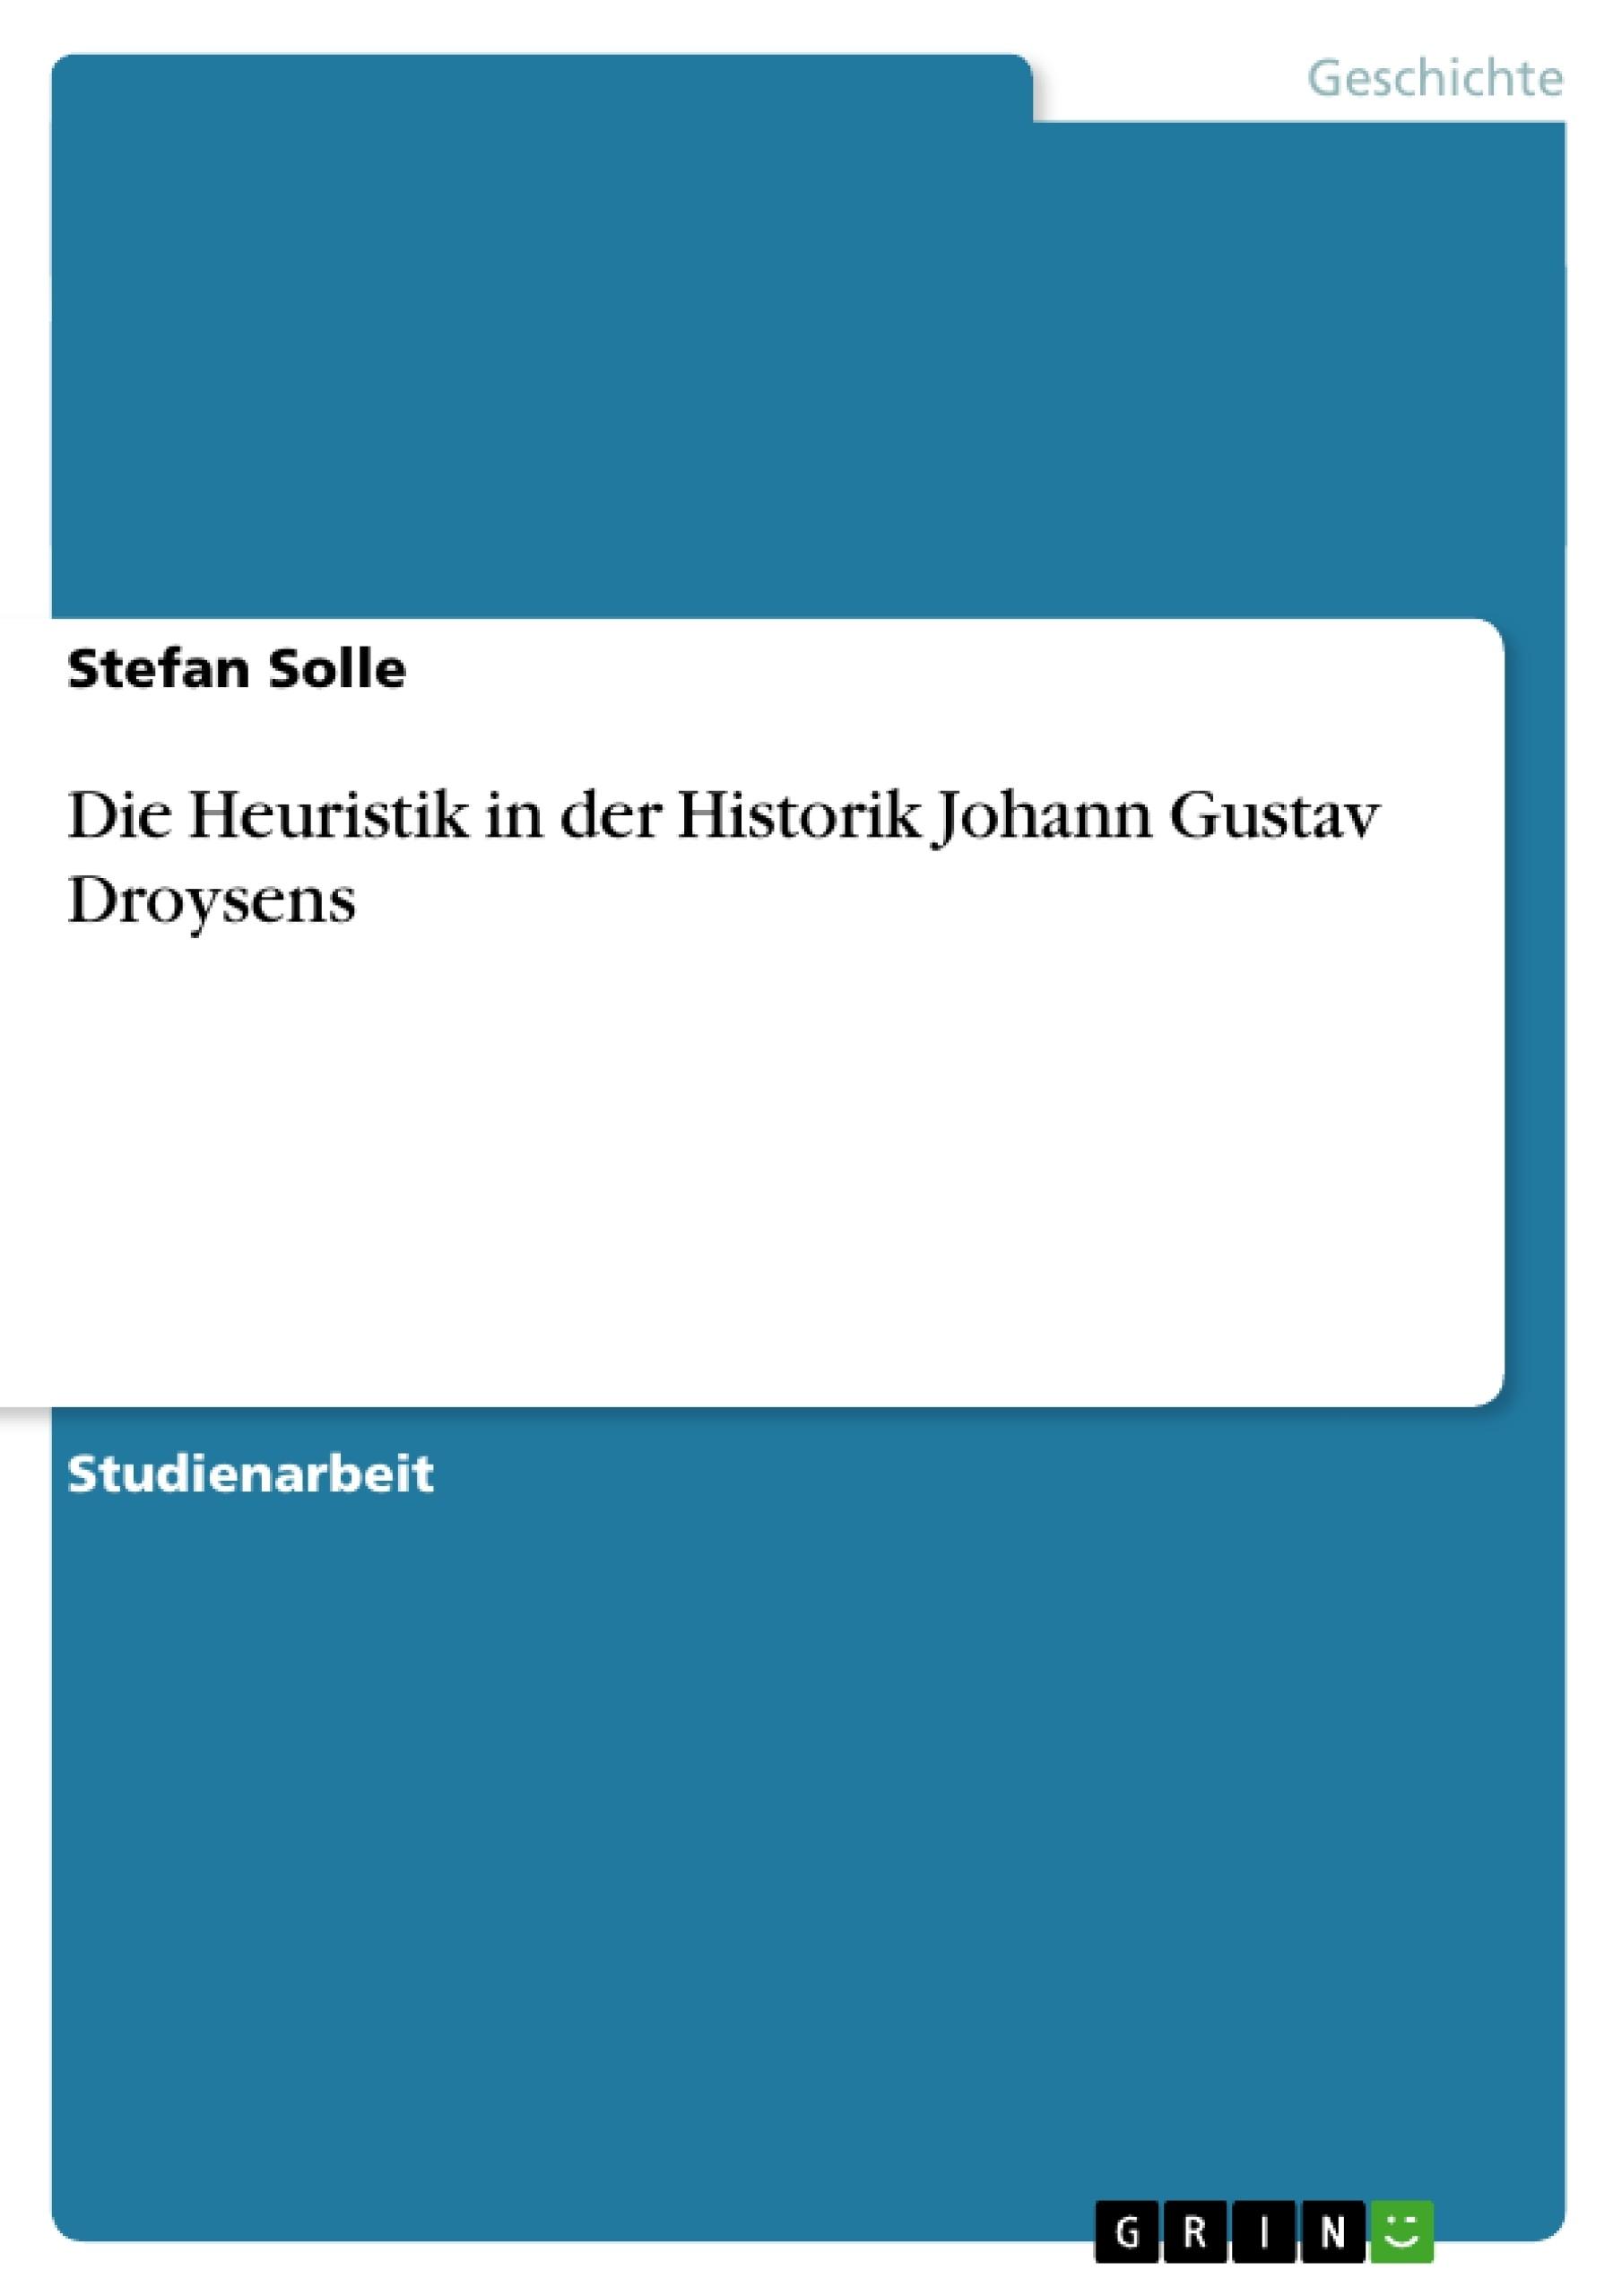 Titel: Die Heuristik in der Historik Johann Gustav Droysens